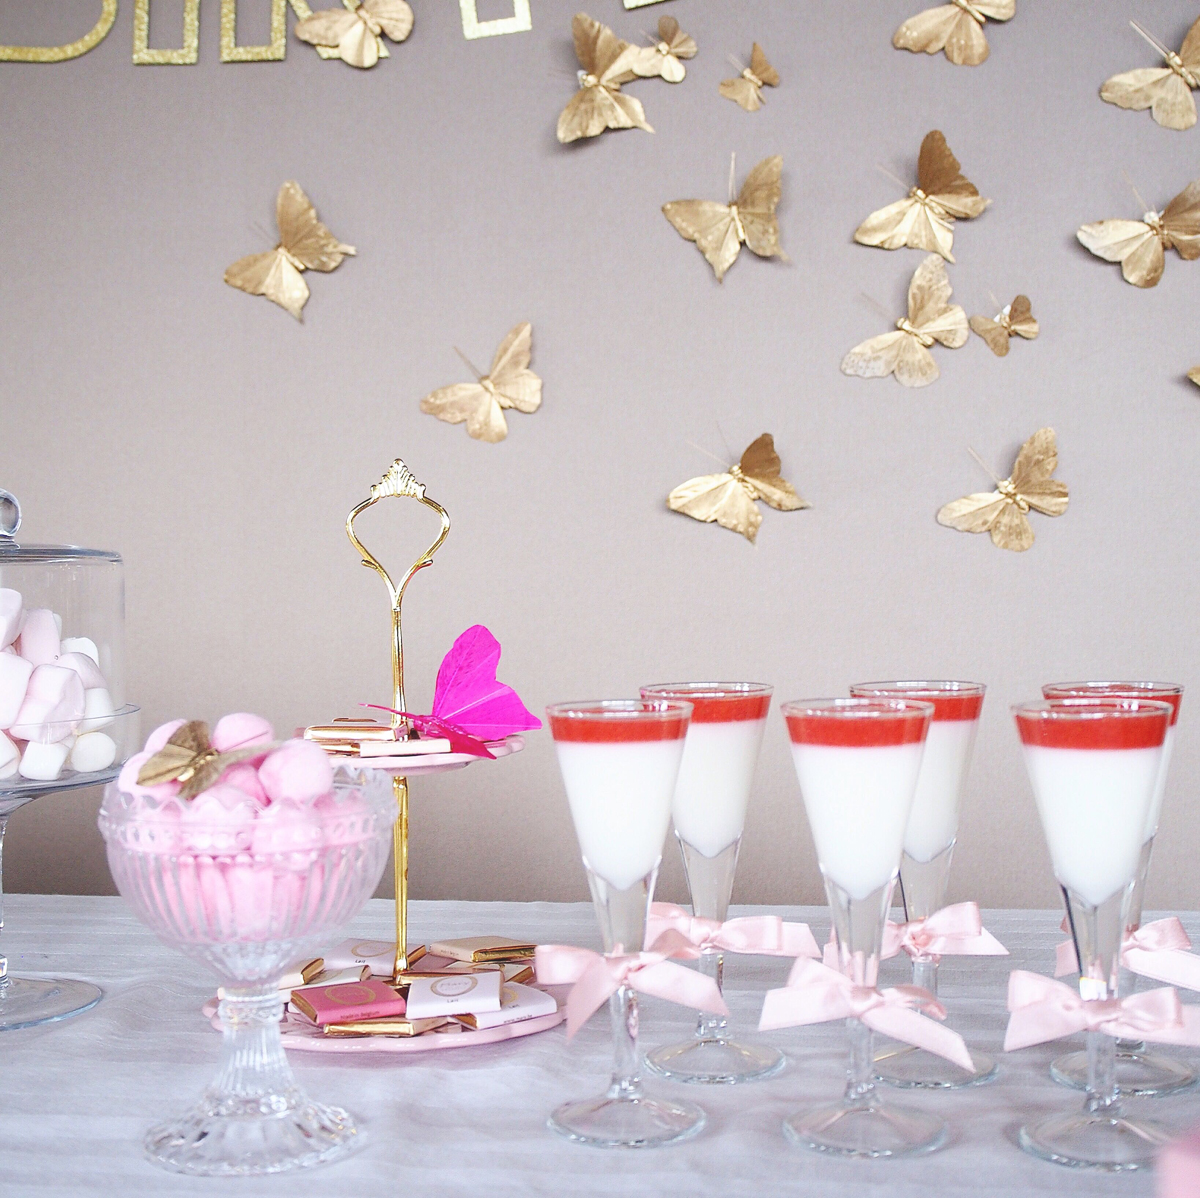 BUTTERFLIES IN PINK|スイーツ装飾|バースデー事例|Tokyo Flamingo|ARCH DAYS